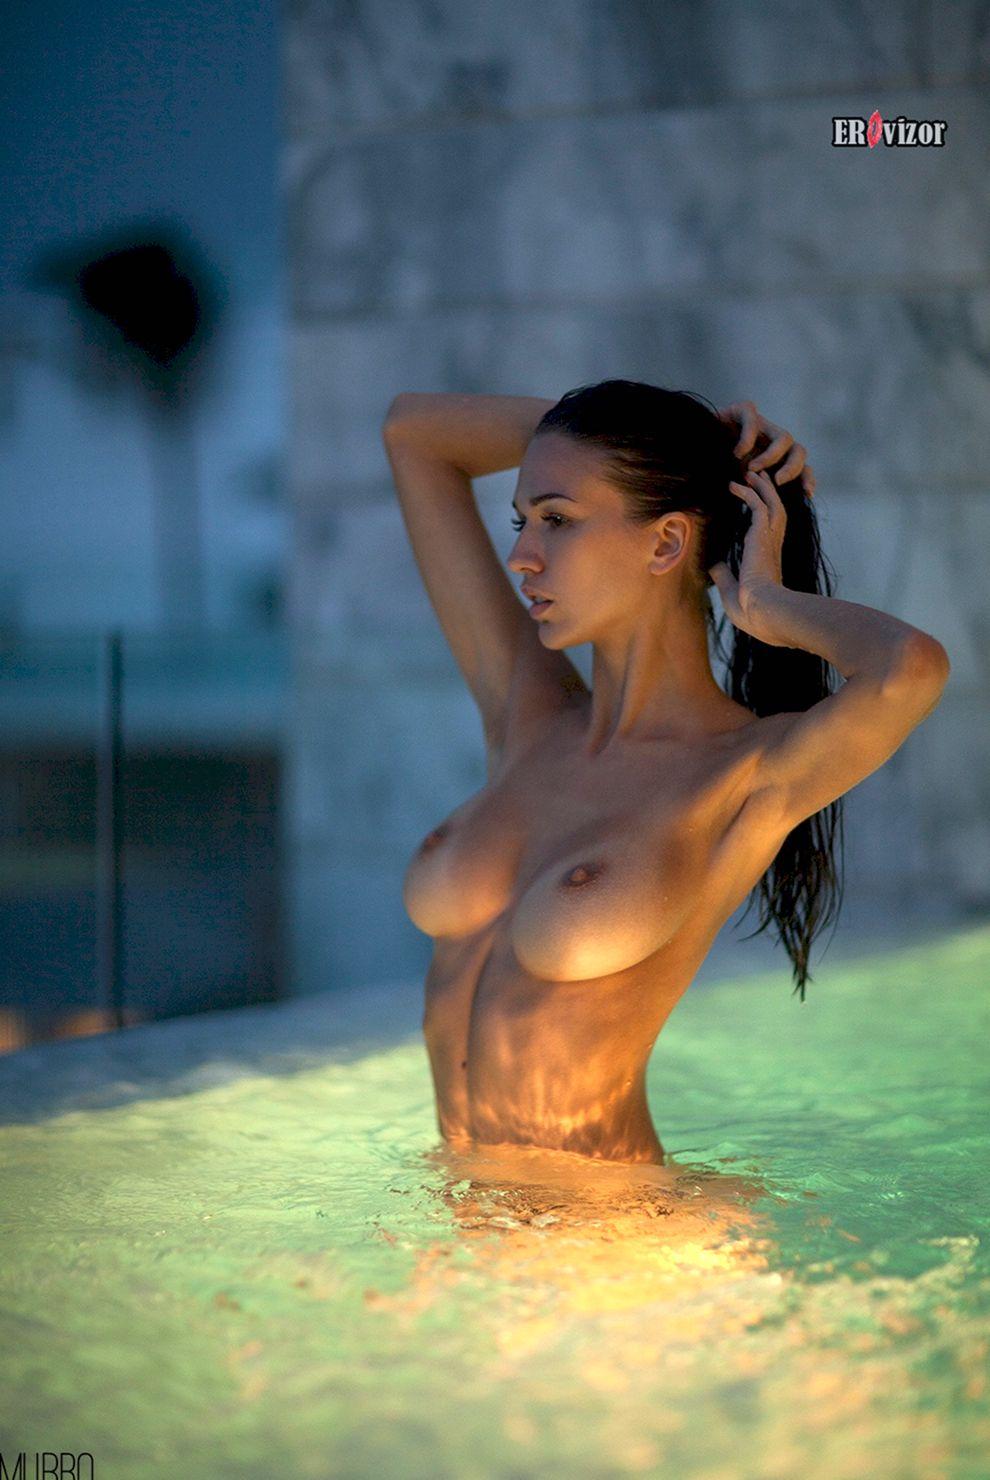 legkaya_erotica-erovizor (33)